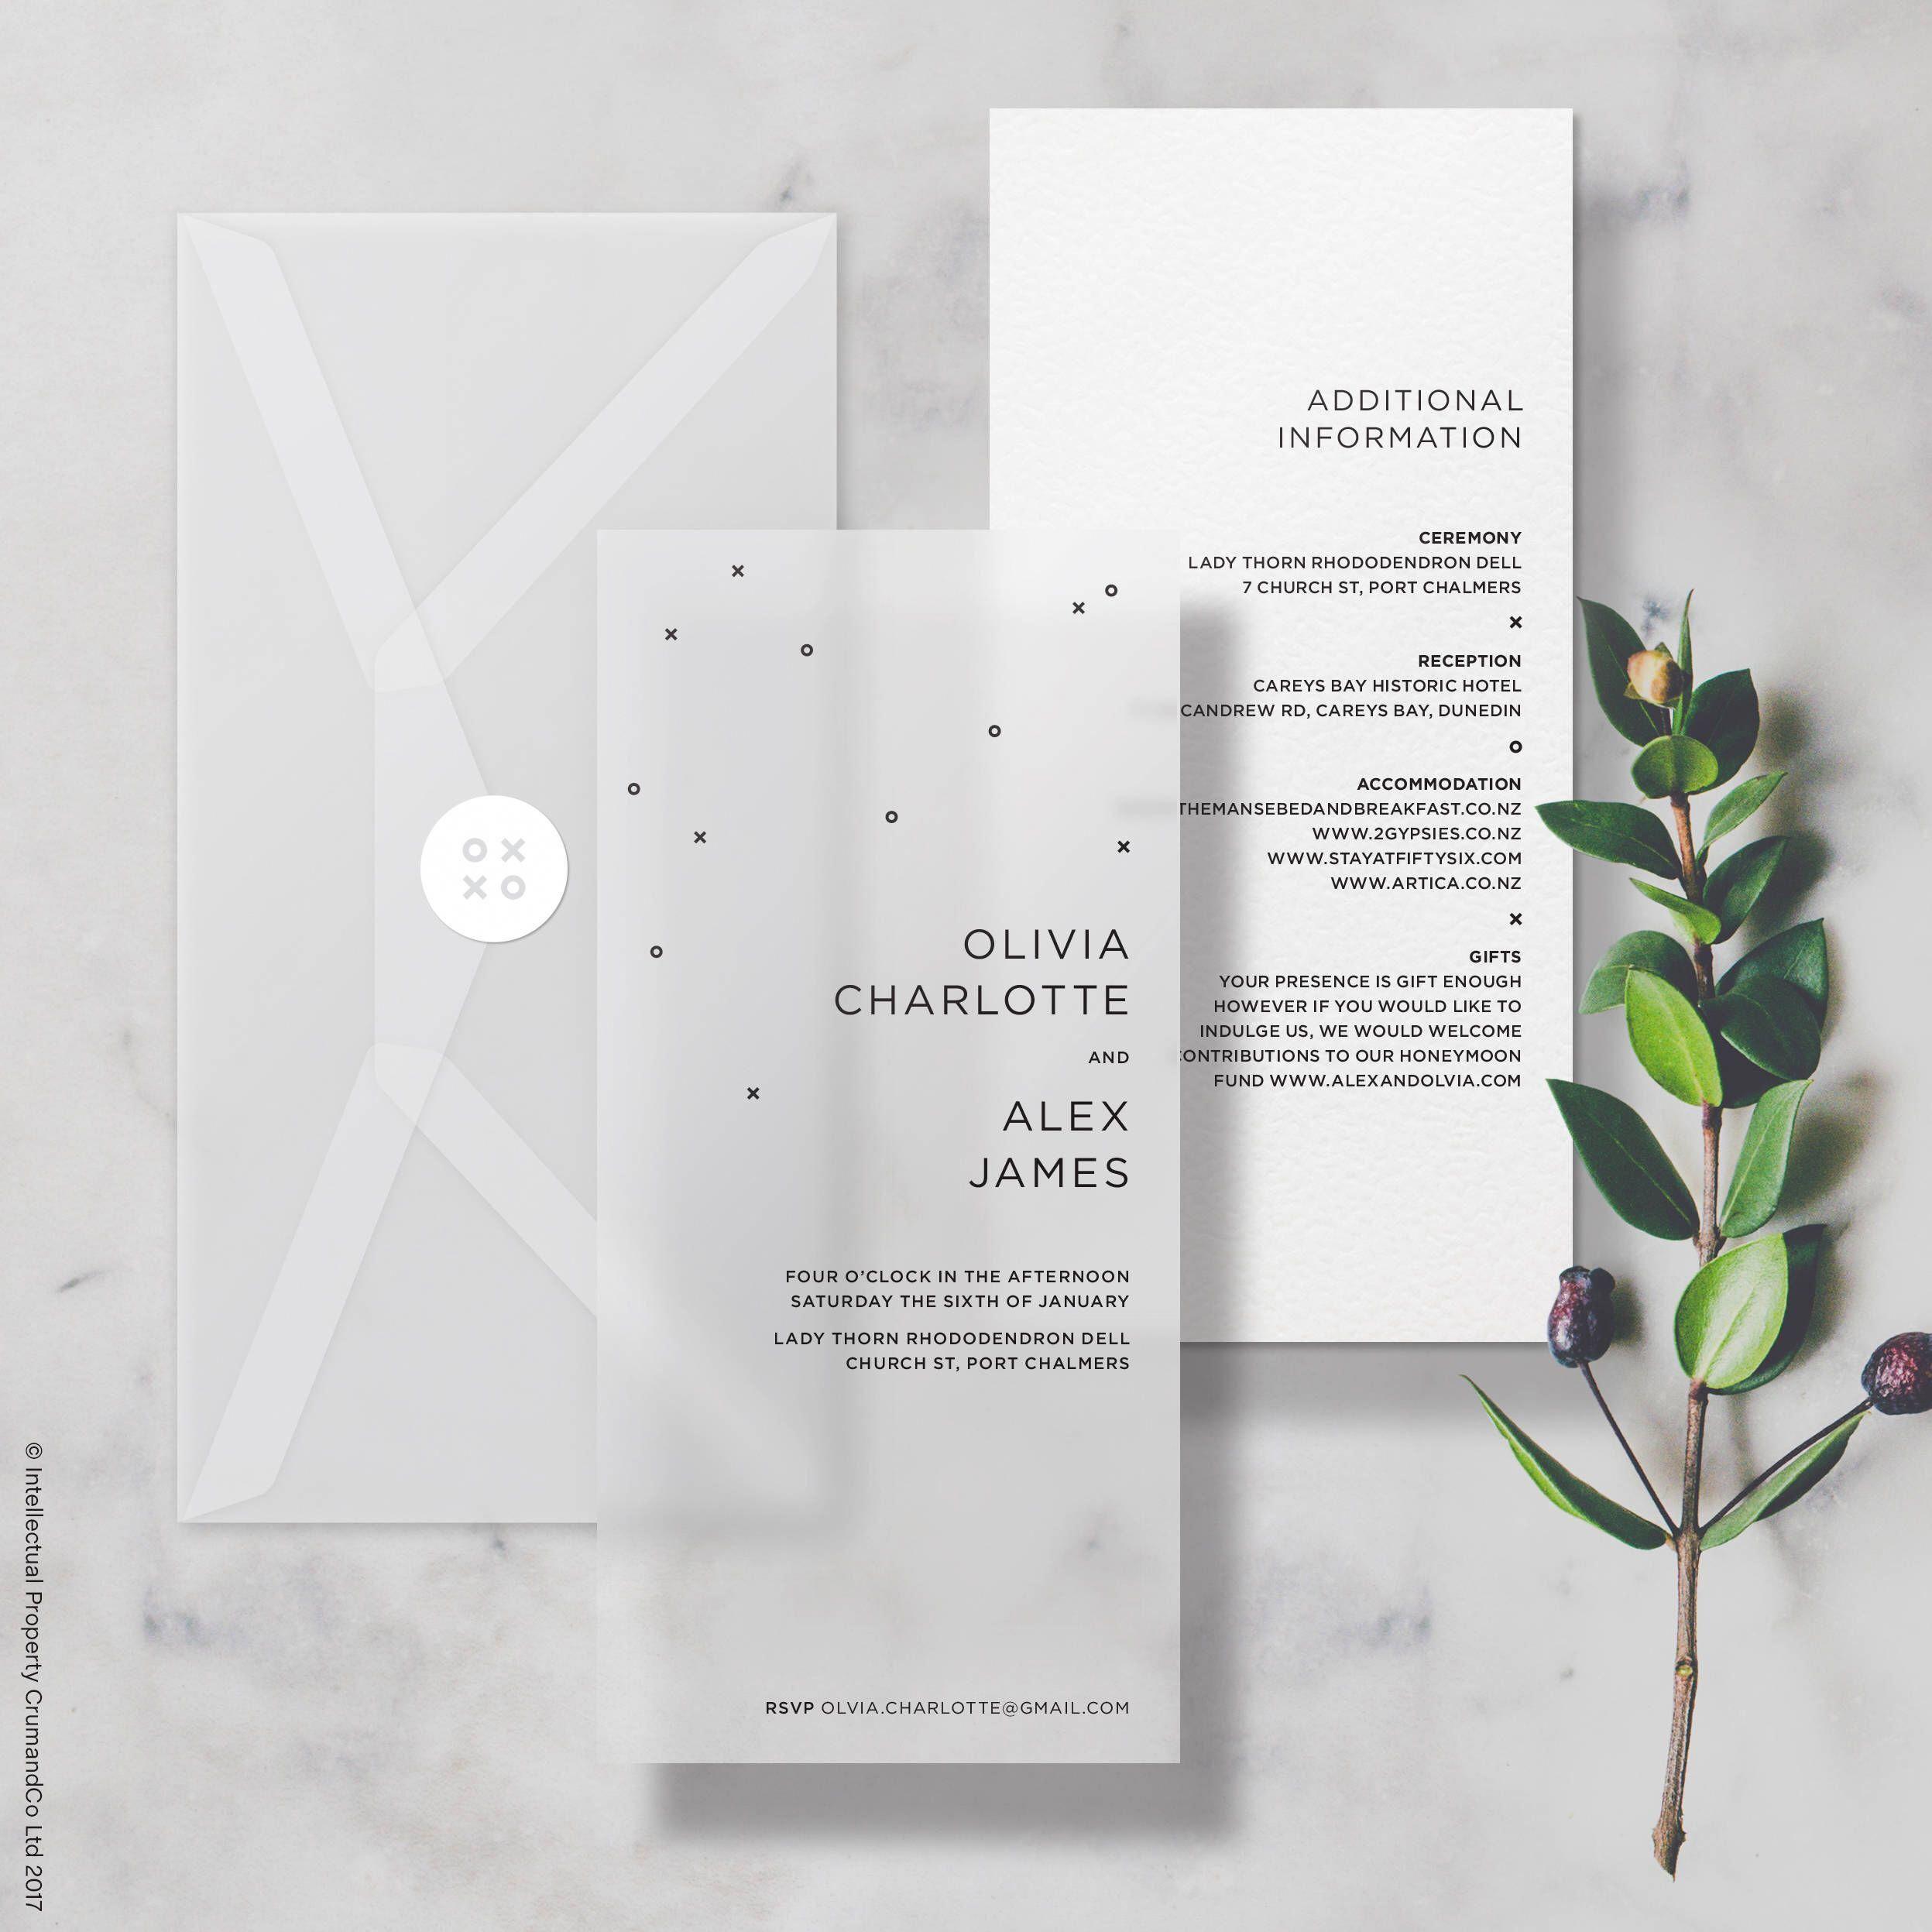 Vellum Minimal Wedding Invitation Invite Includes Info Card Choice Of Envelope Wedd Minimal Wedding Invitation Wedding Invitation Cards Wedding Stationery